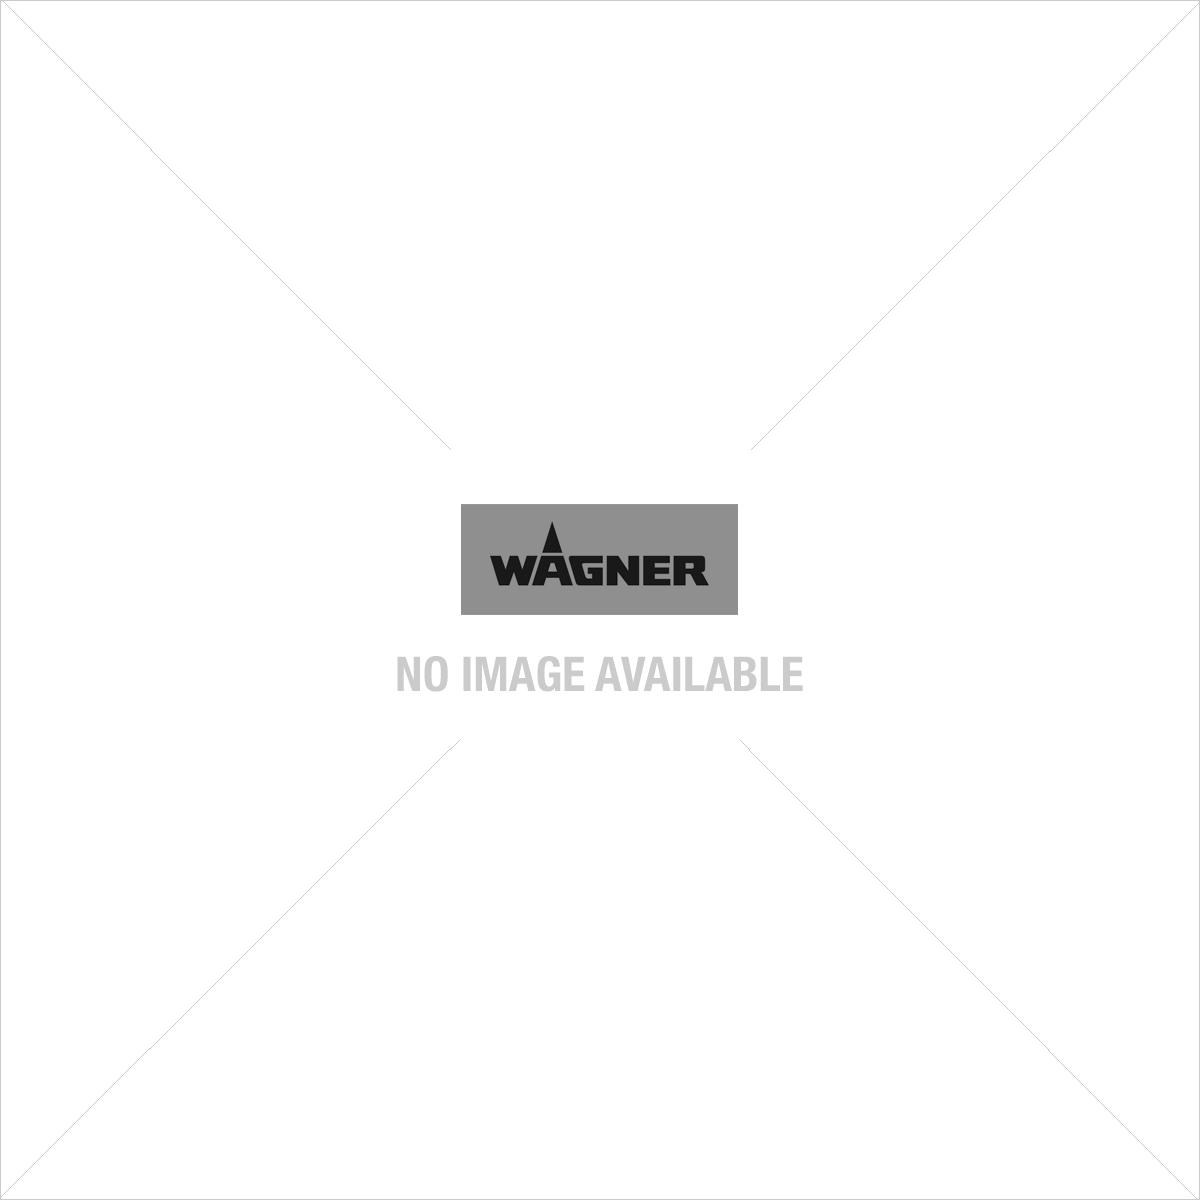 Wagner ProjectPro 117 Airless Paint Sprayer